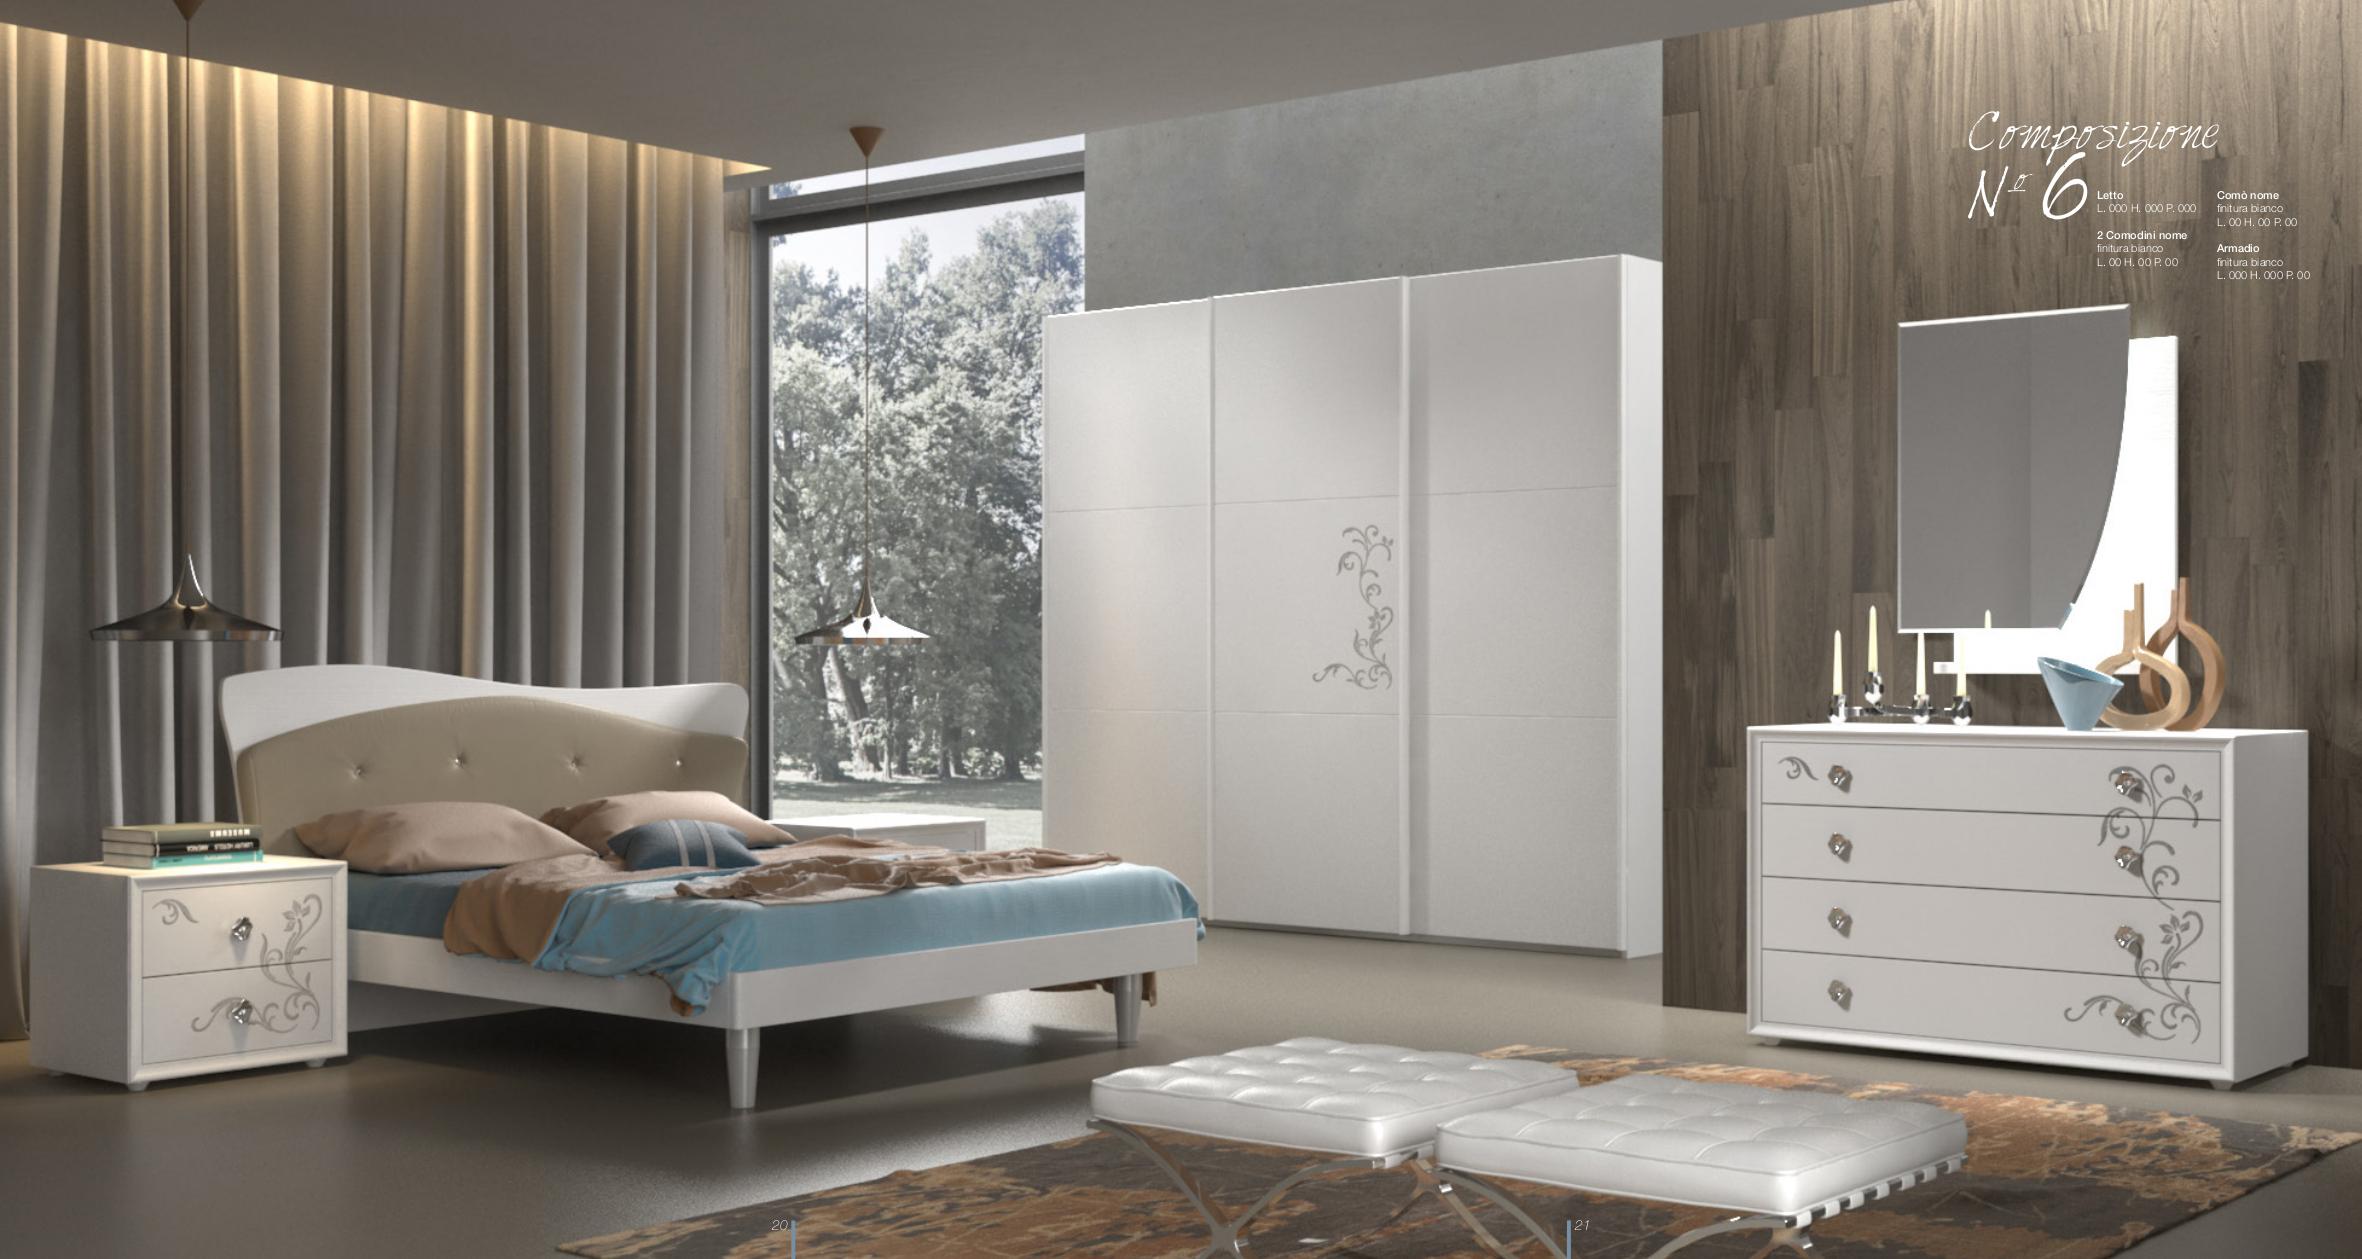 Camera da letto moderna contemporanea Sicilia,Catania,Messina,Enna ...